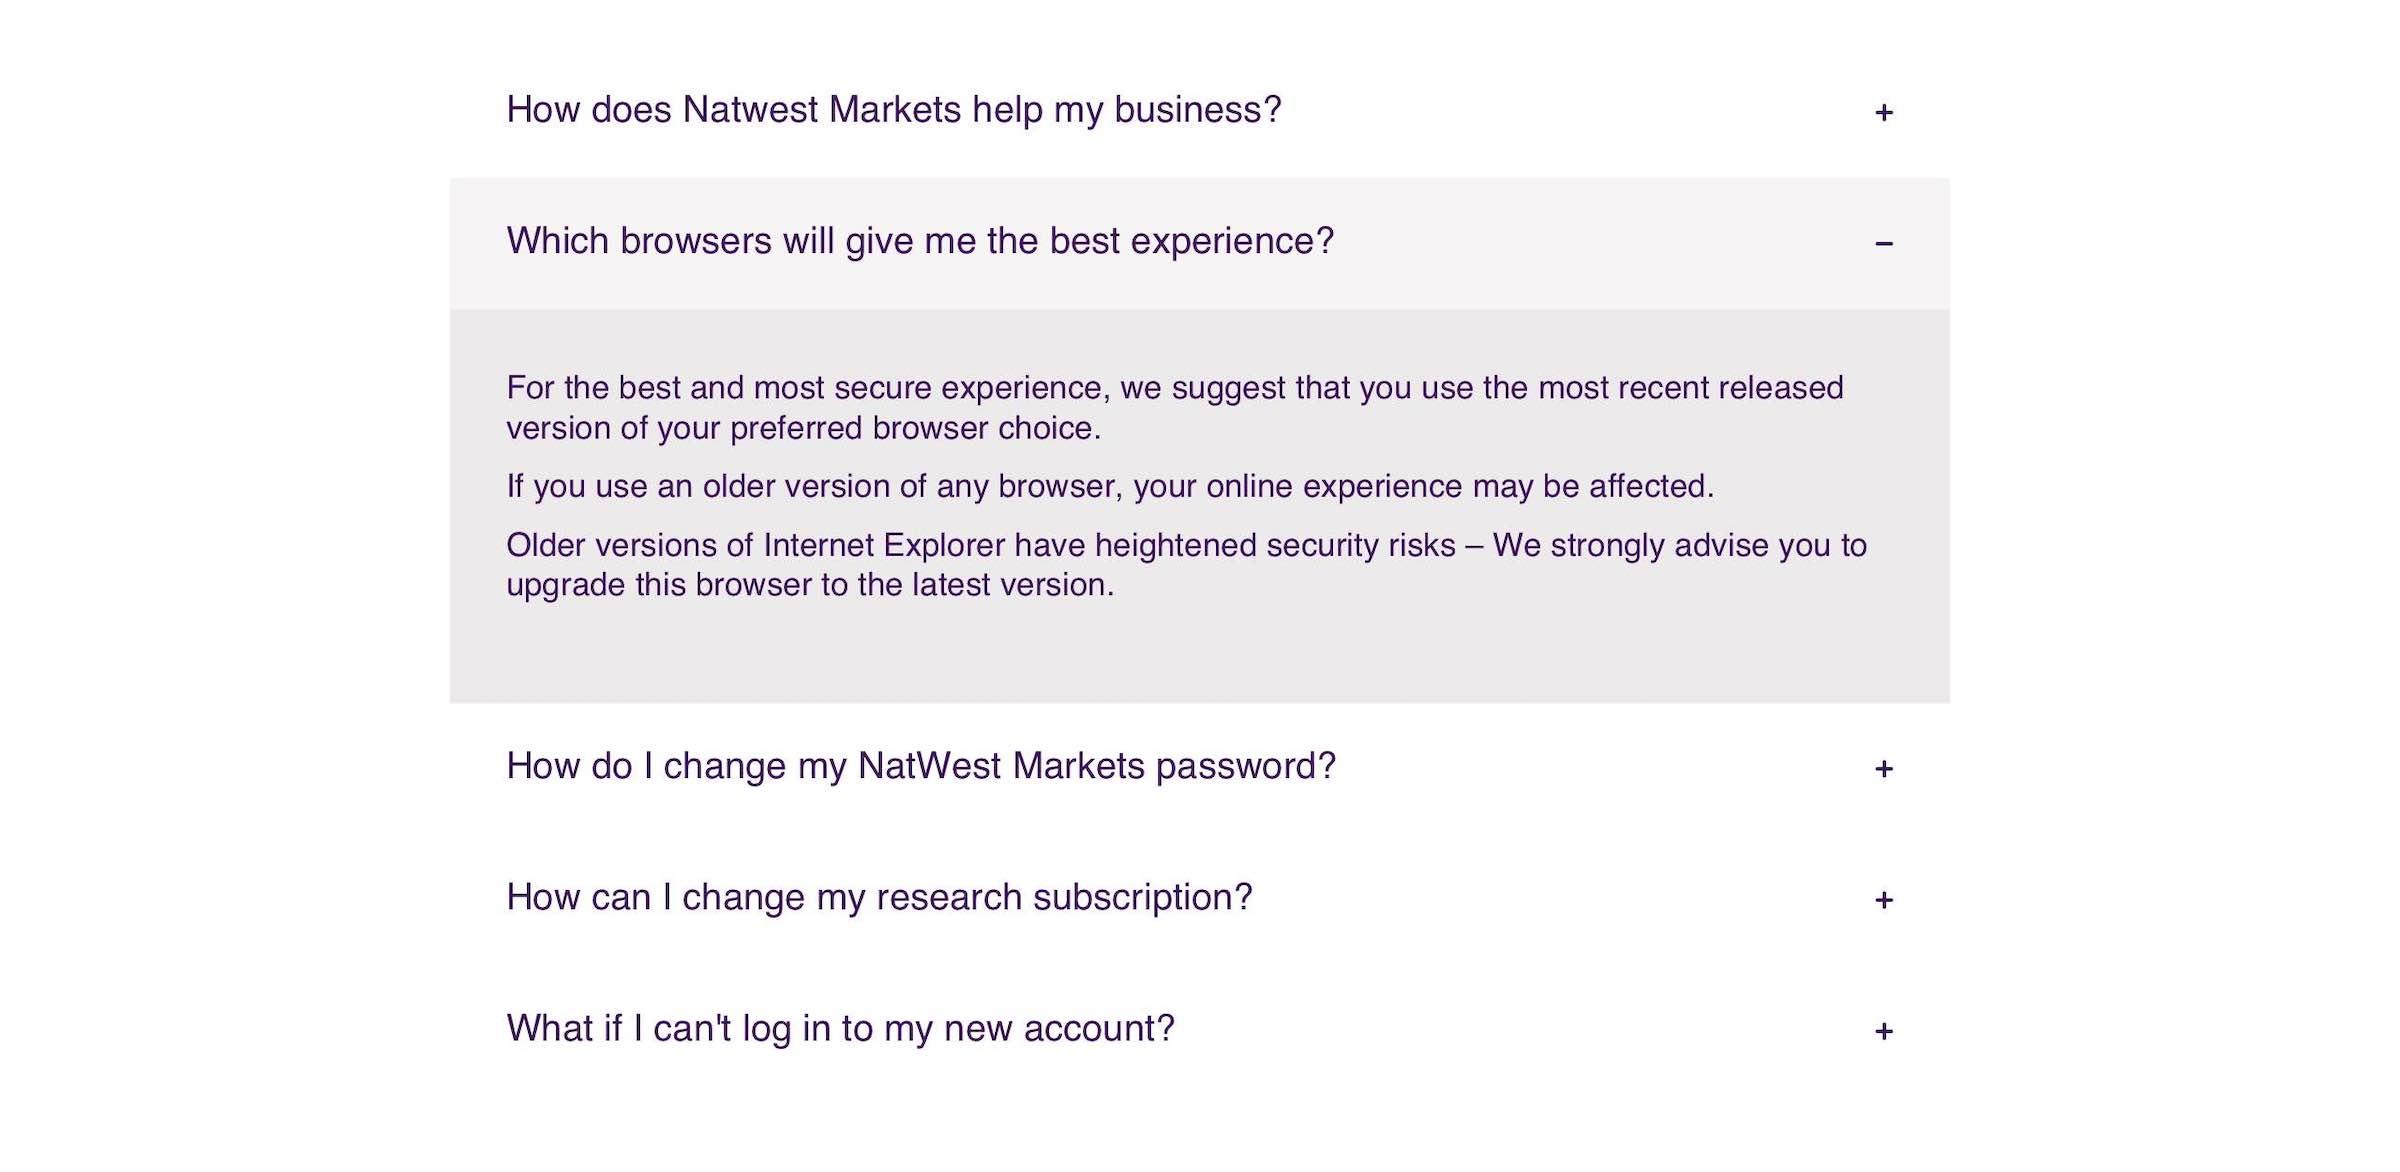 Natwestmarkets-Support@2x